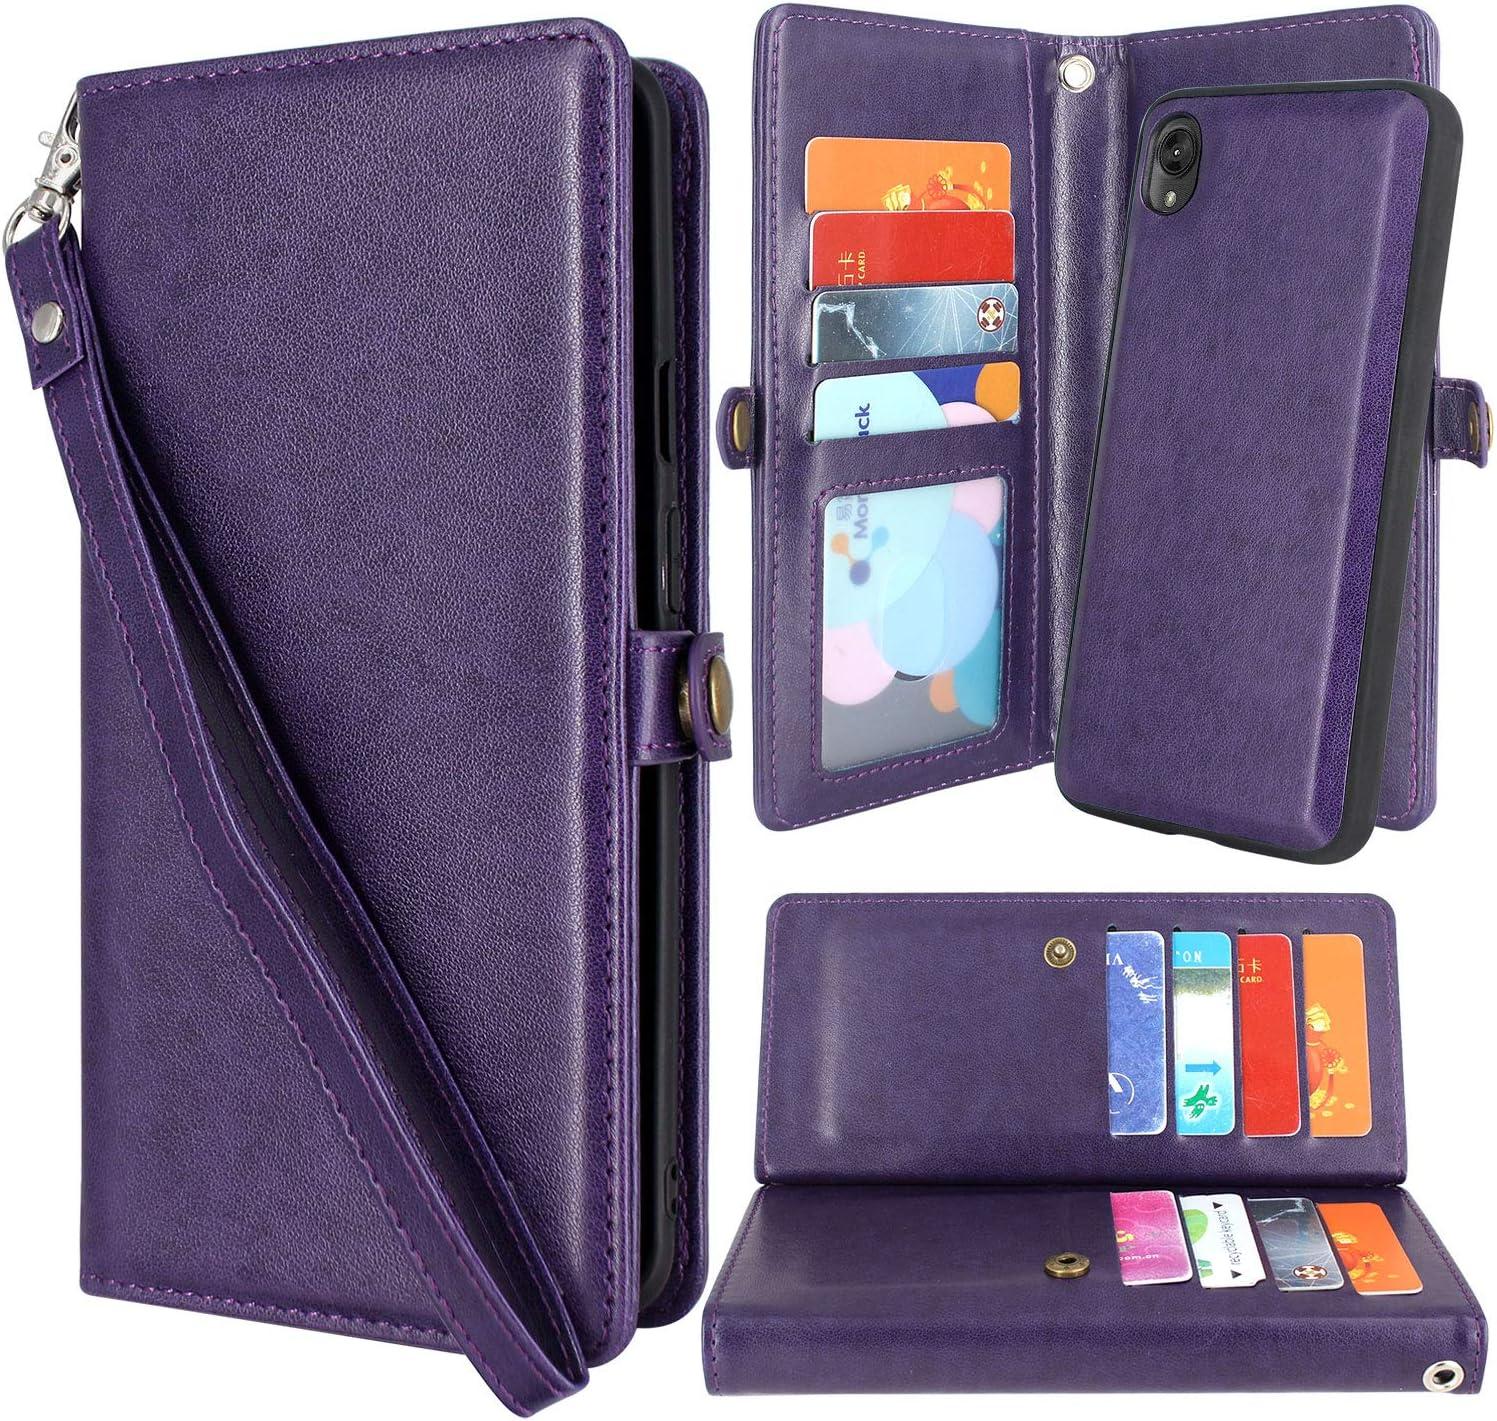 Harryshell Moto E6 Case, Detachable Magnetic 12 Card Slots Wallet Case Shockproof PU Leather Flip Protective Cover Wrist Strap for Motorola Moto E6 (2019) (Purple)